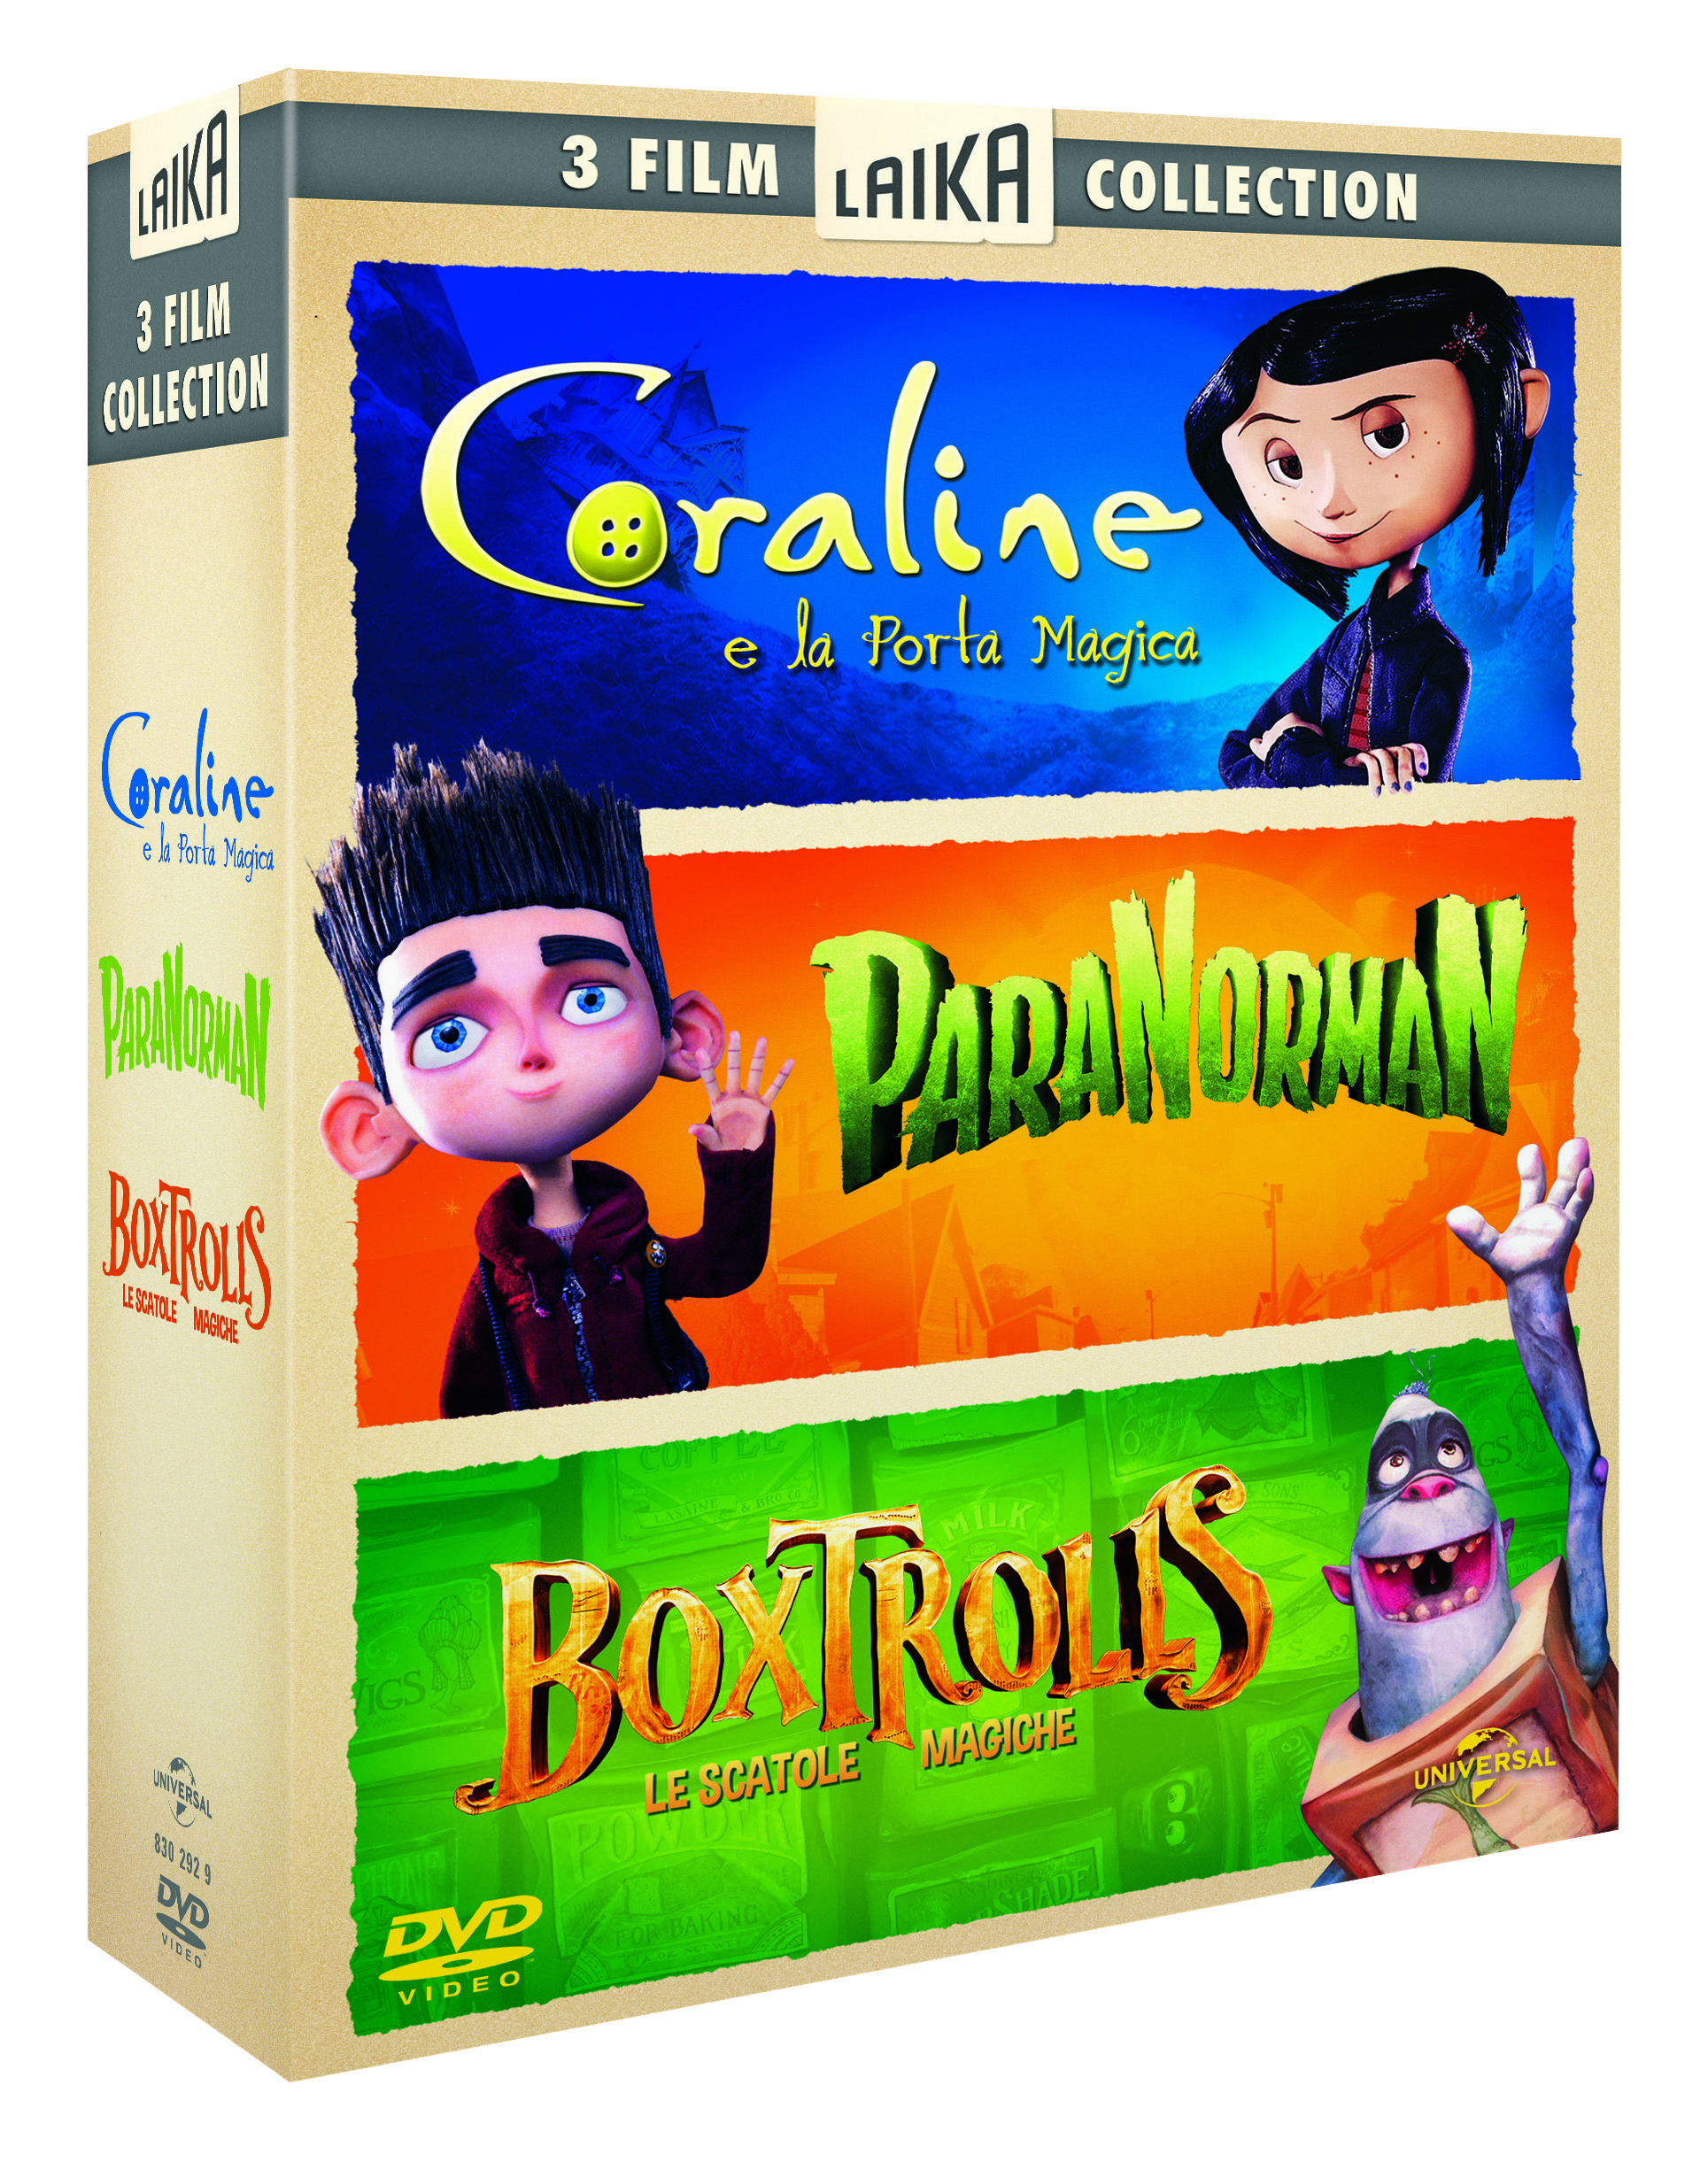 box dvd coraline paranorman, boxtroll